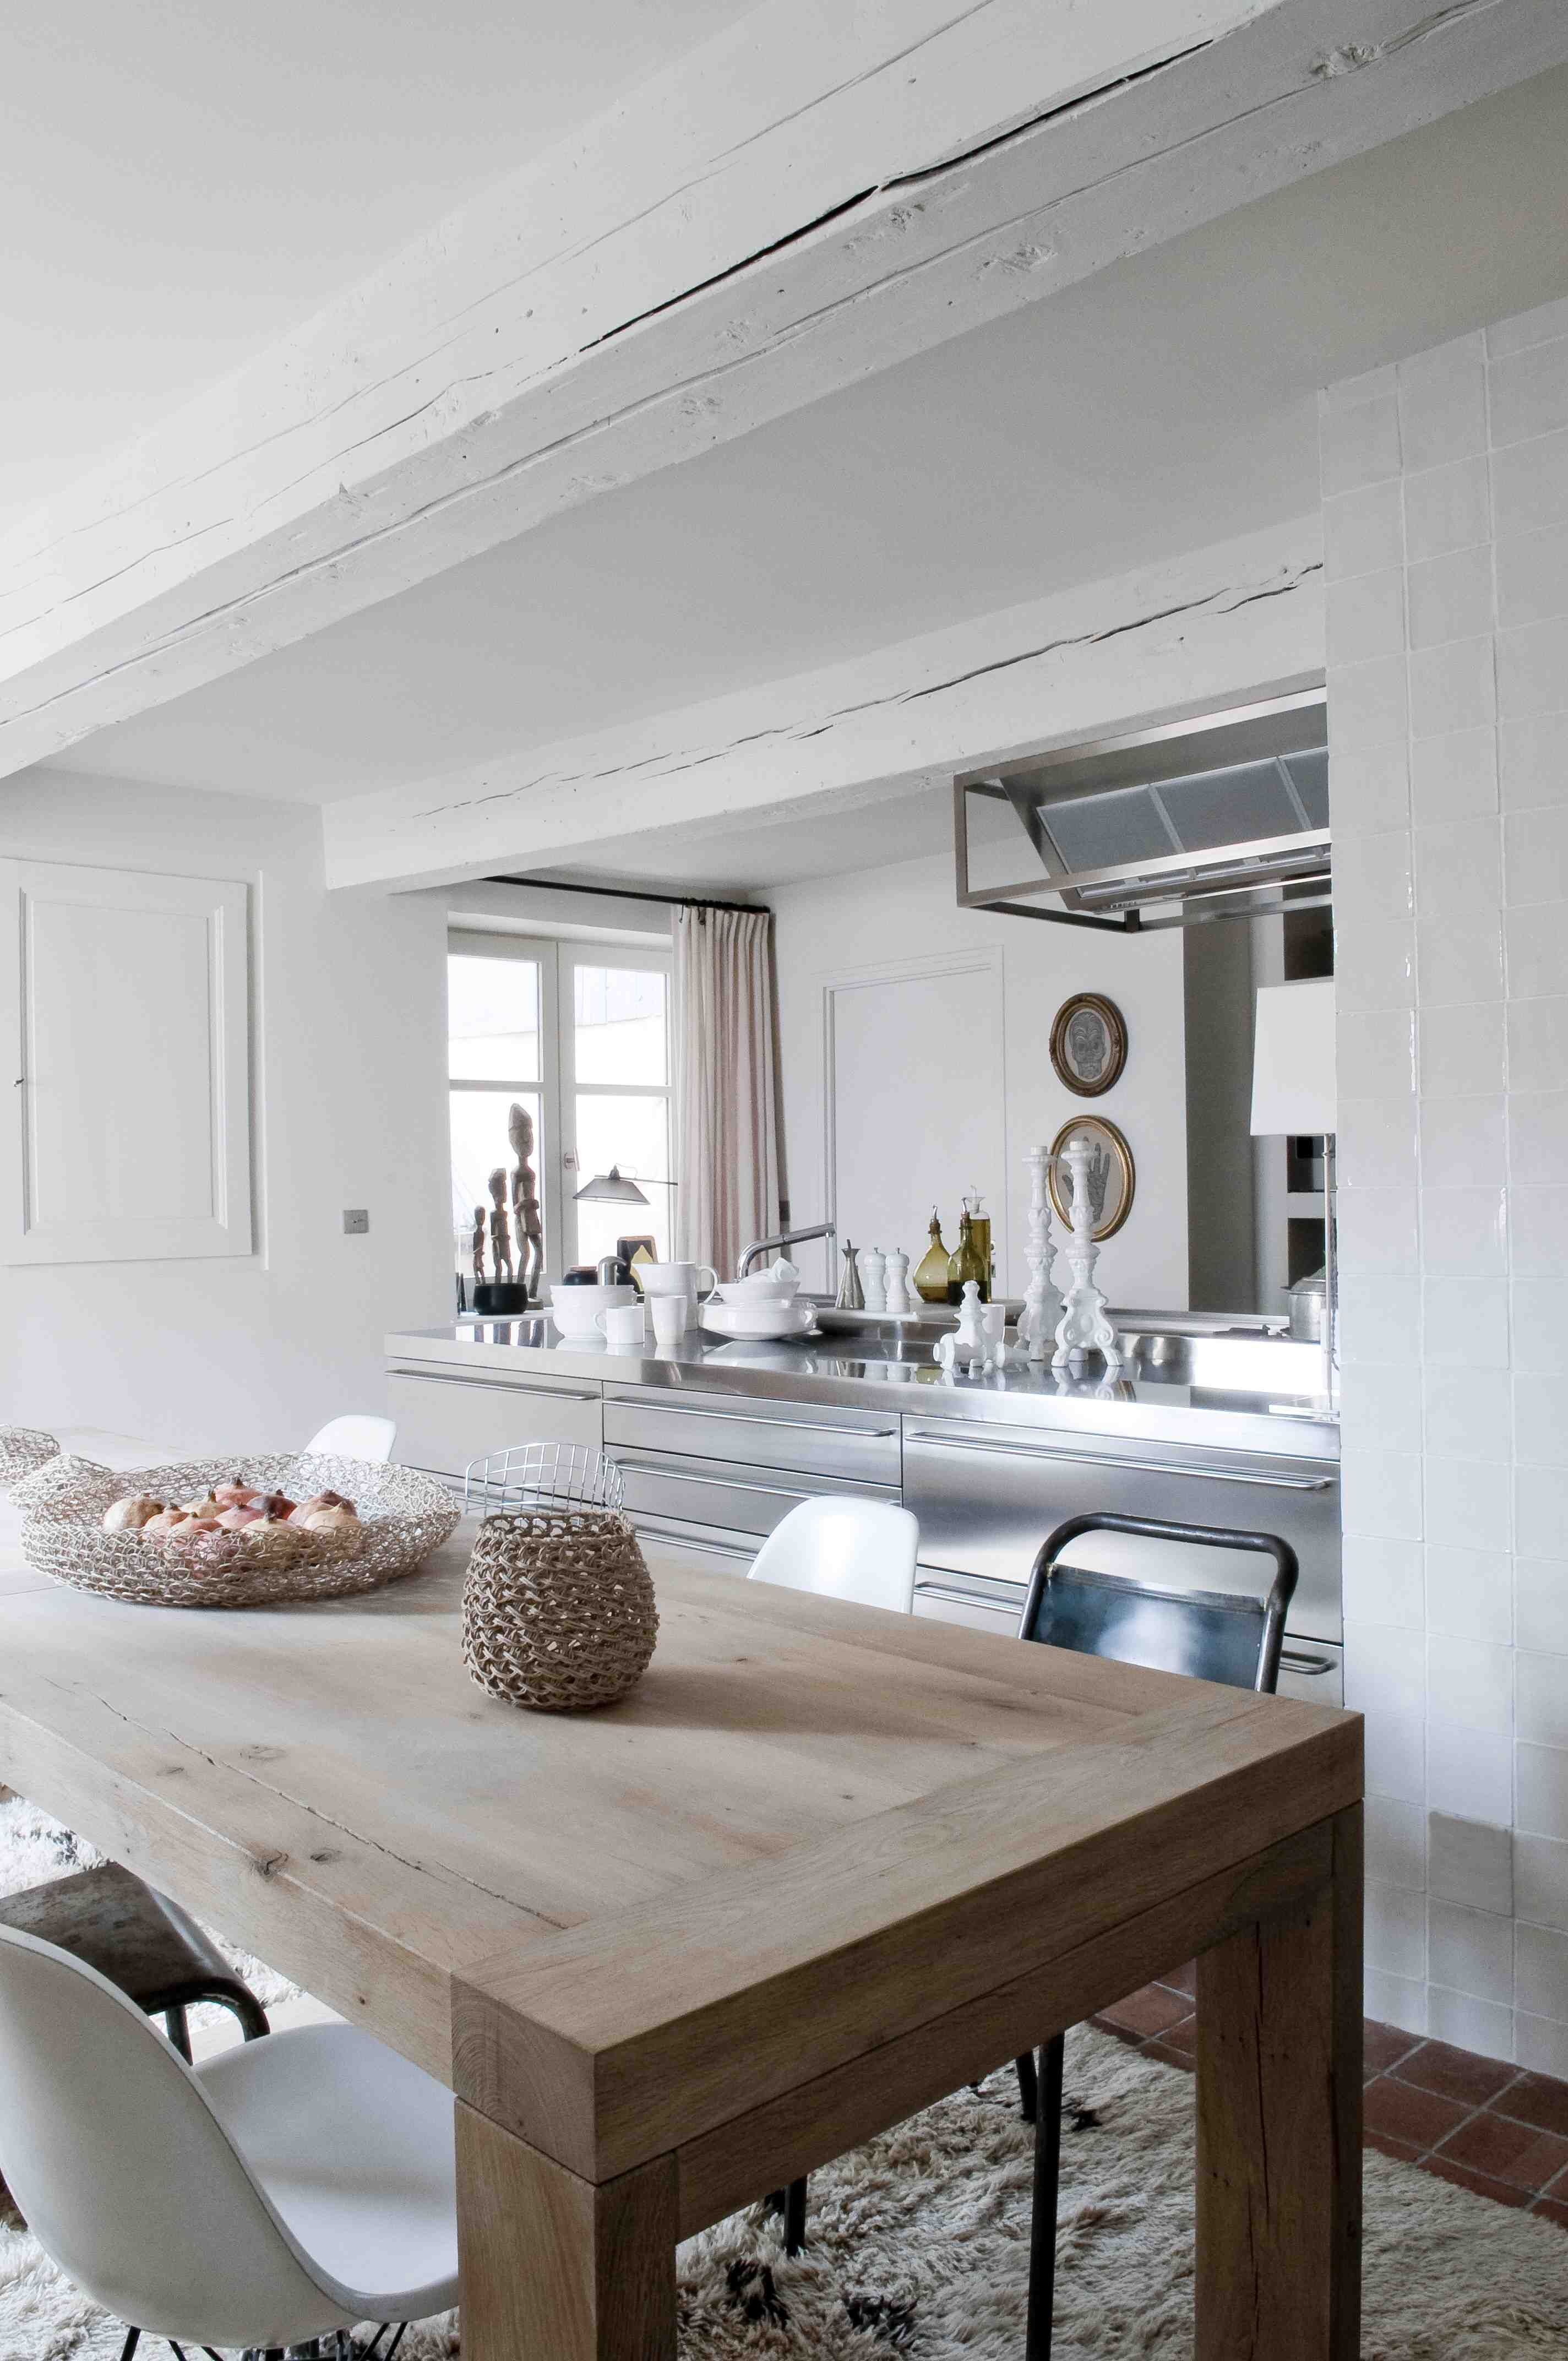 Appartement LYON by Maison HAND | REALISATIONS | Pinterest | Lyon ...